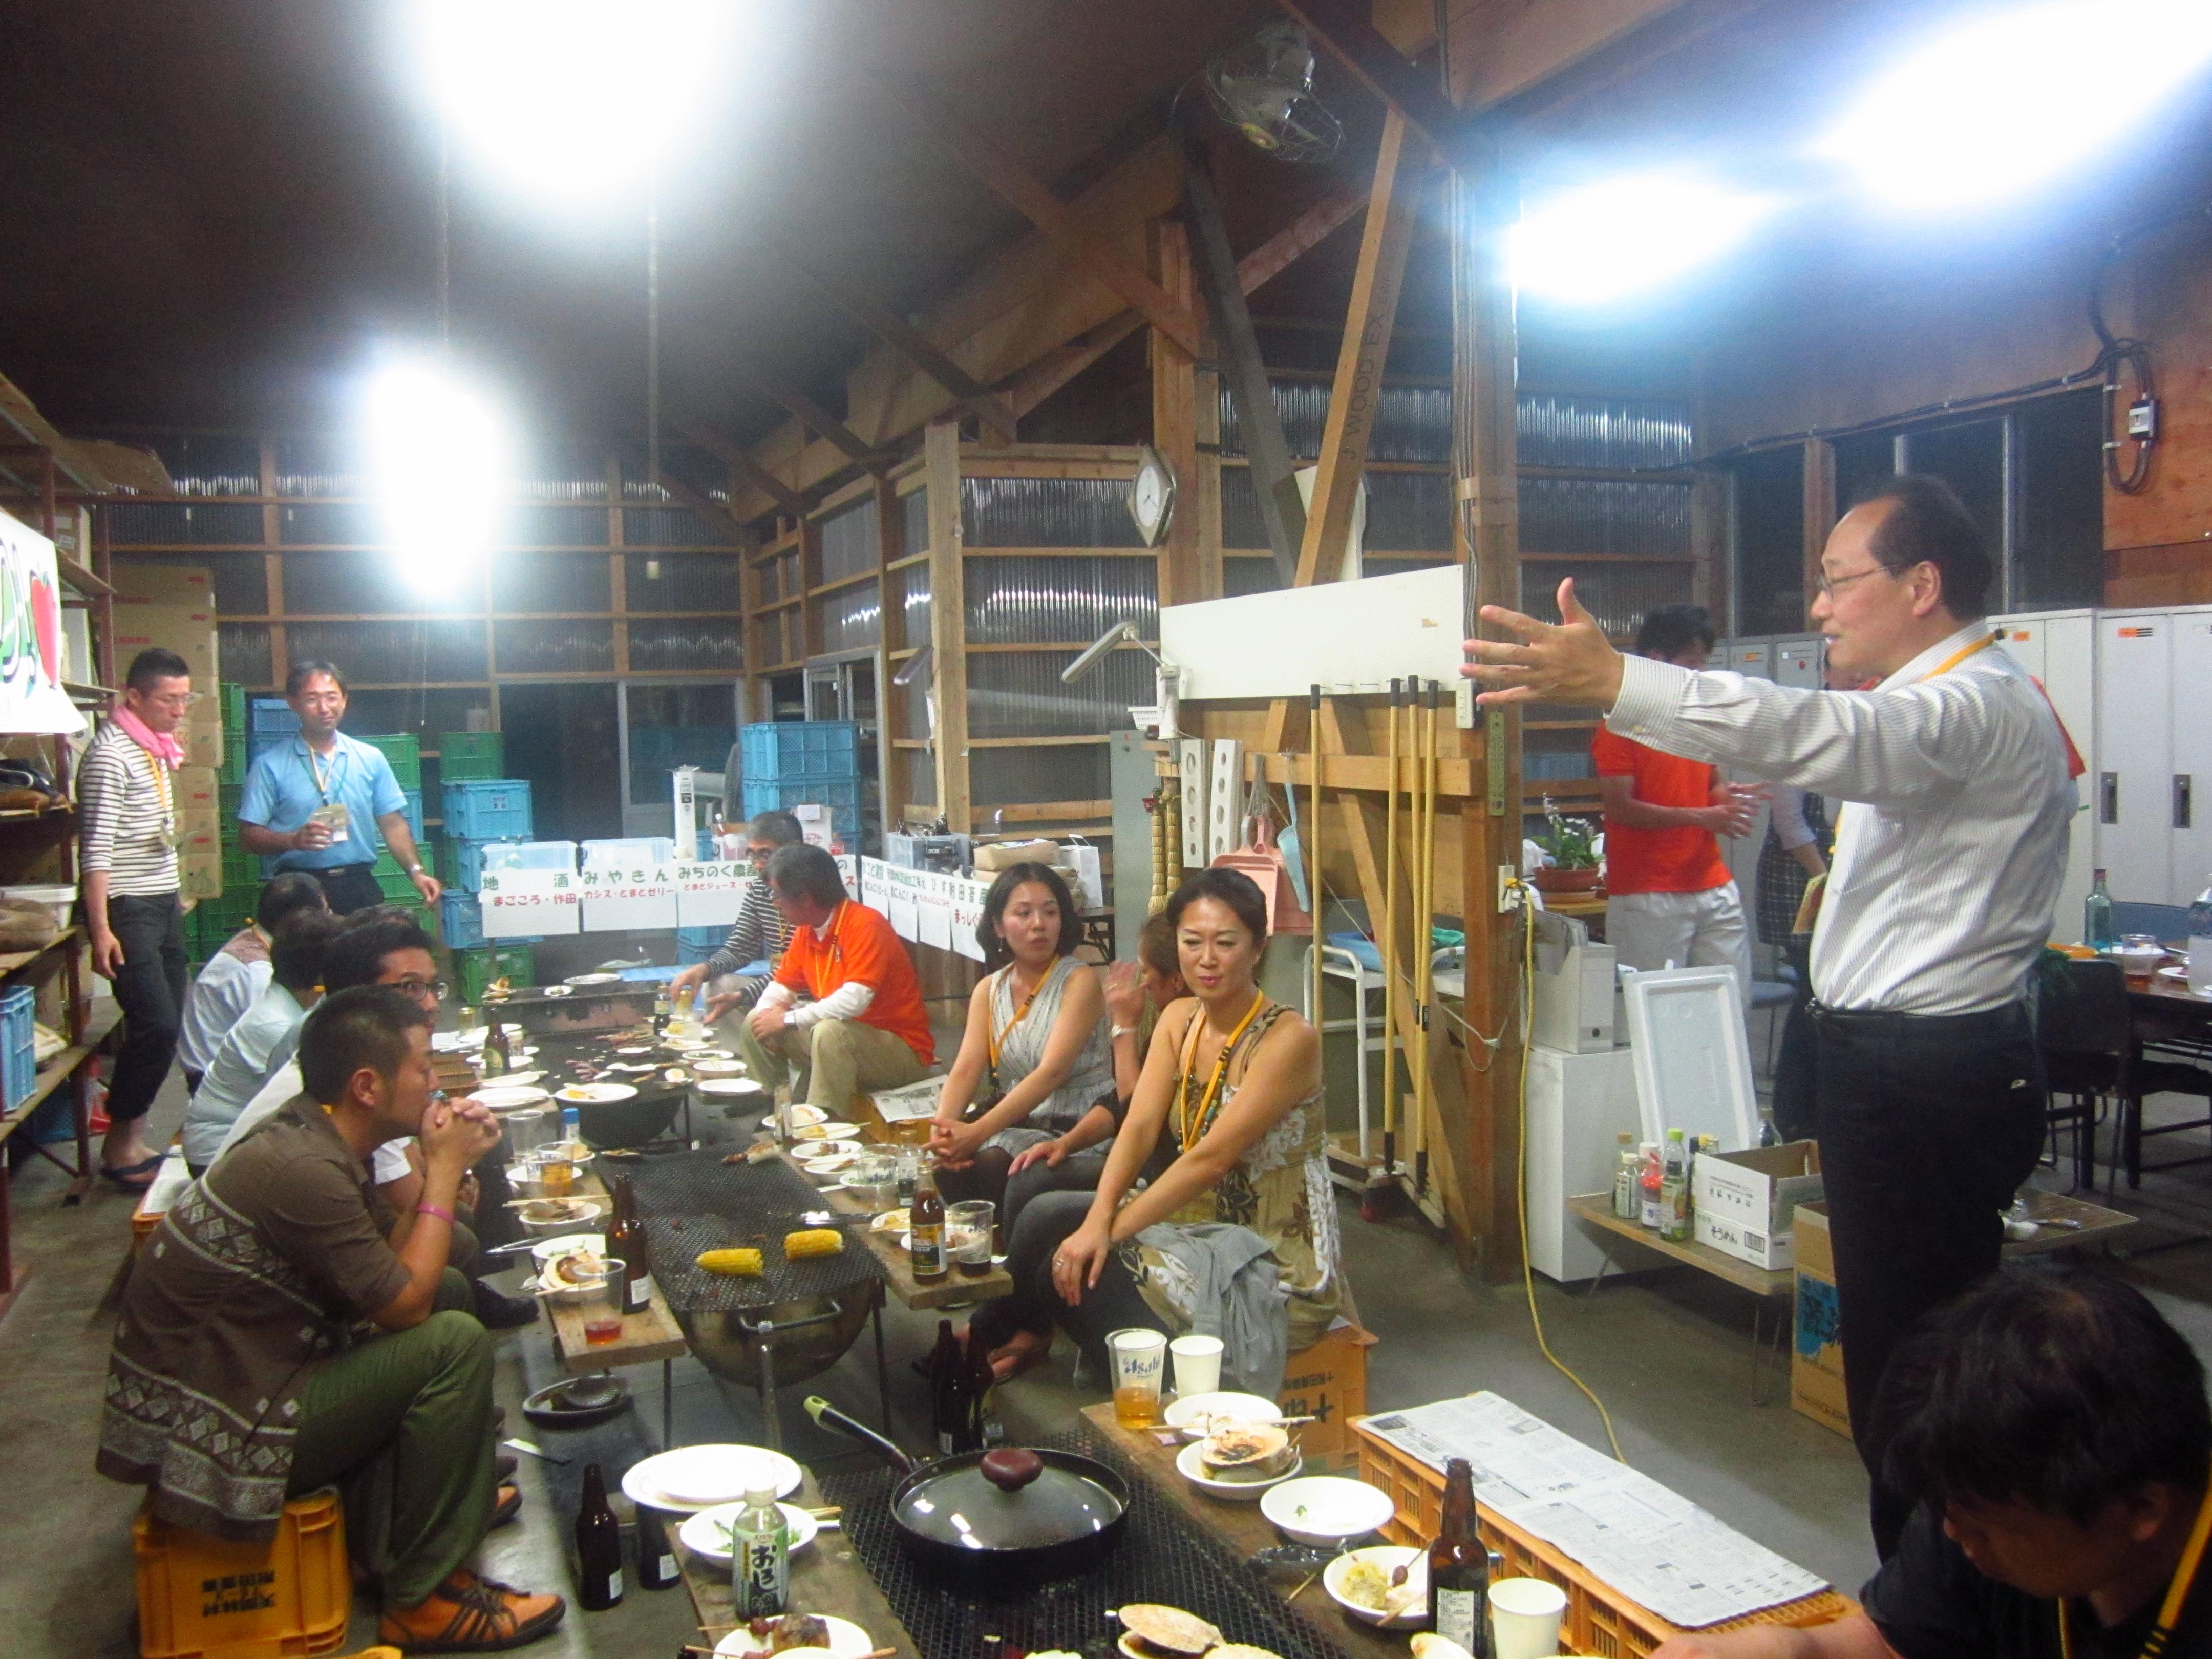 IMG 4341 - 麻布十番納涼祭り25,26日(七戸町出店)